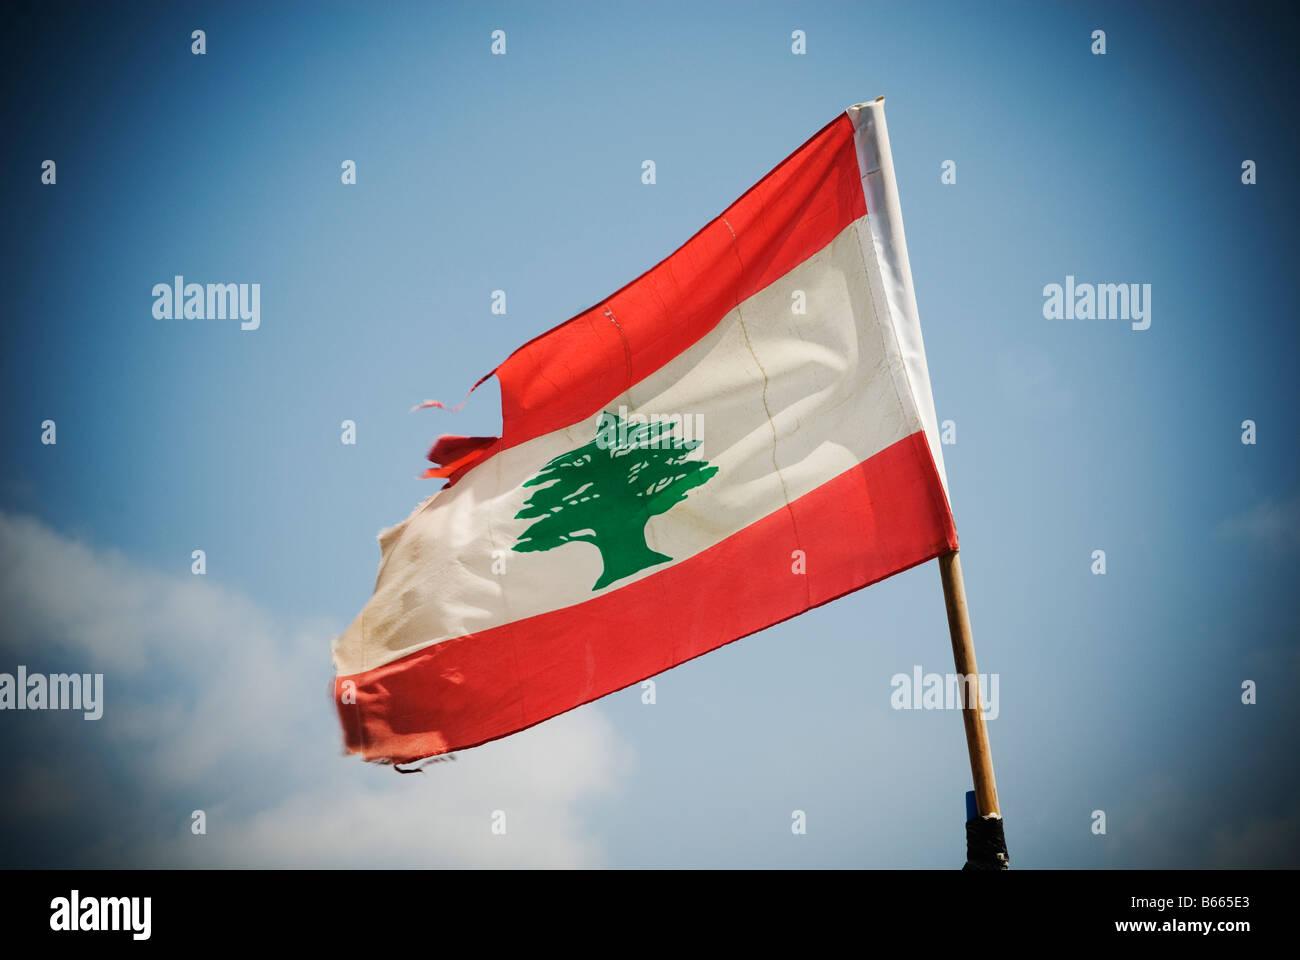 Lebanon Flag - Stock Image